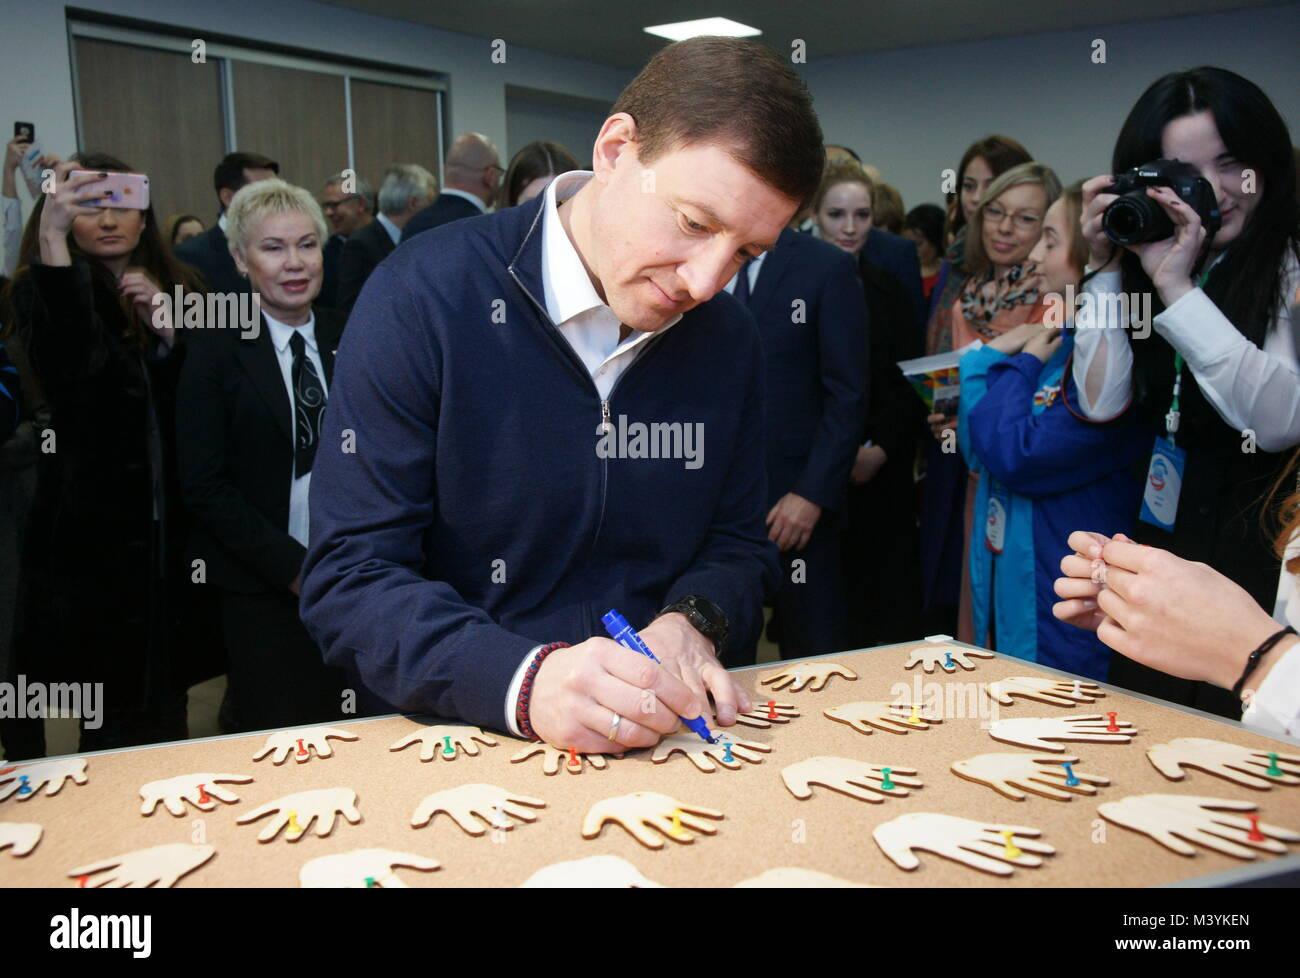 VLADIKAVKAZ, RUSSIA - FEBRUARY 13, 2018: Russian State Duma member Andrei Turchak (C front) at a gathering of members - Stock Image